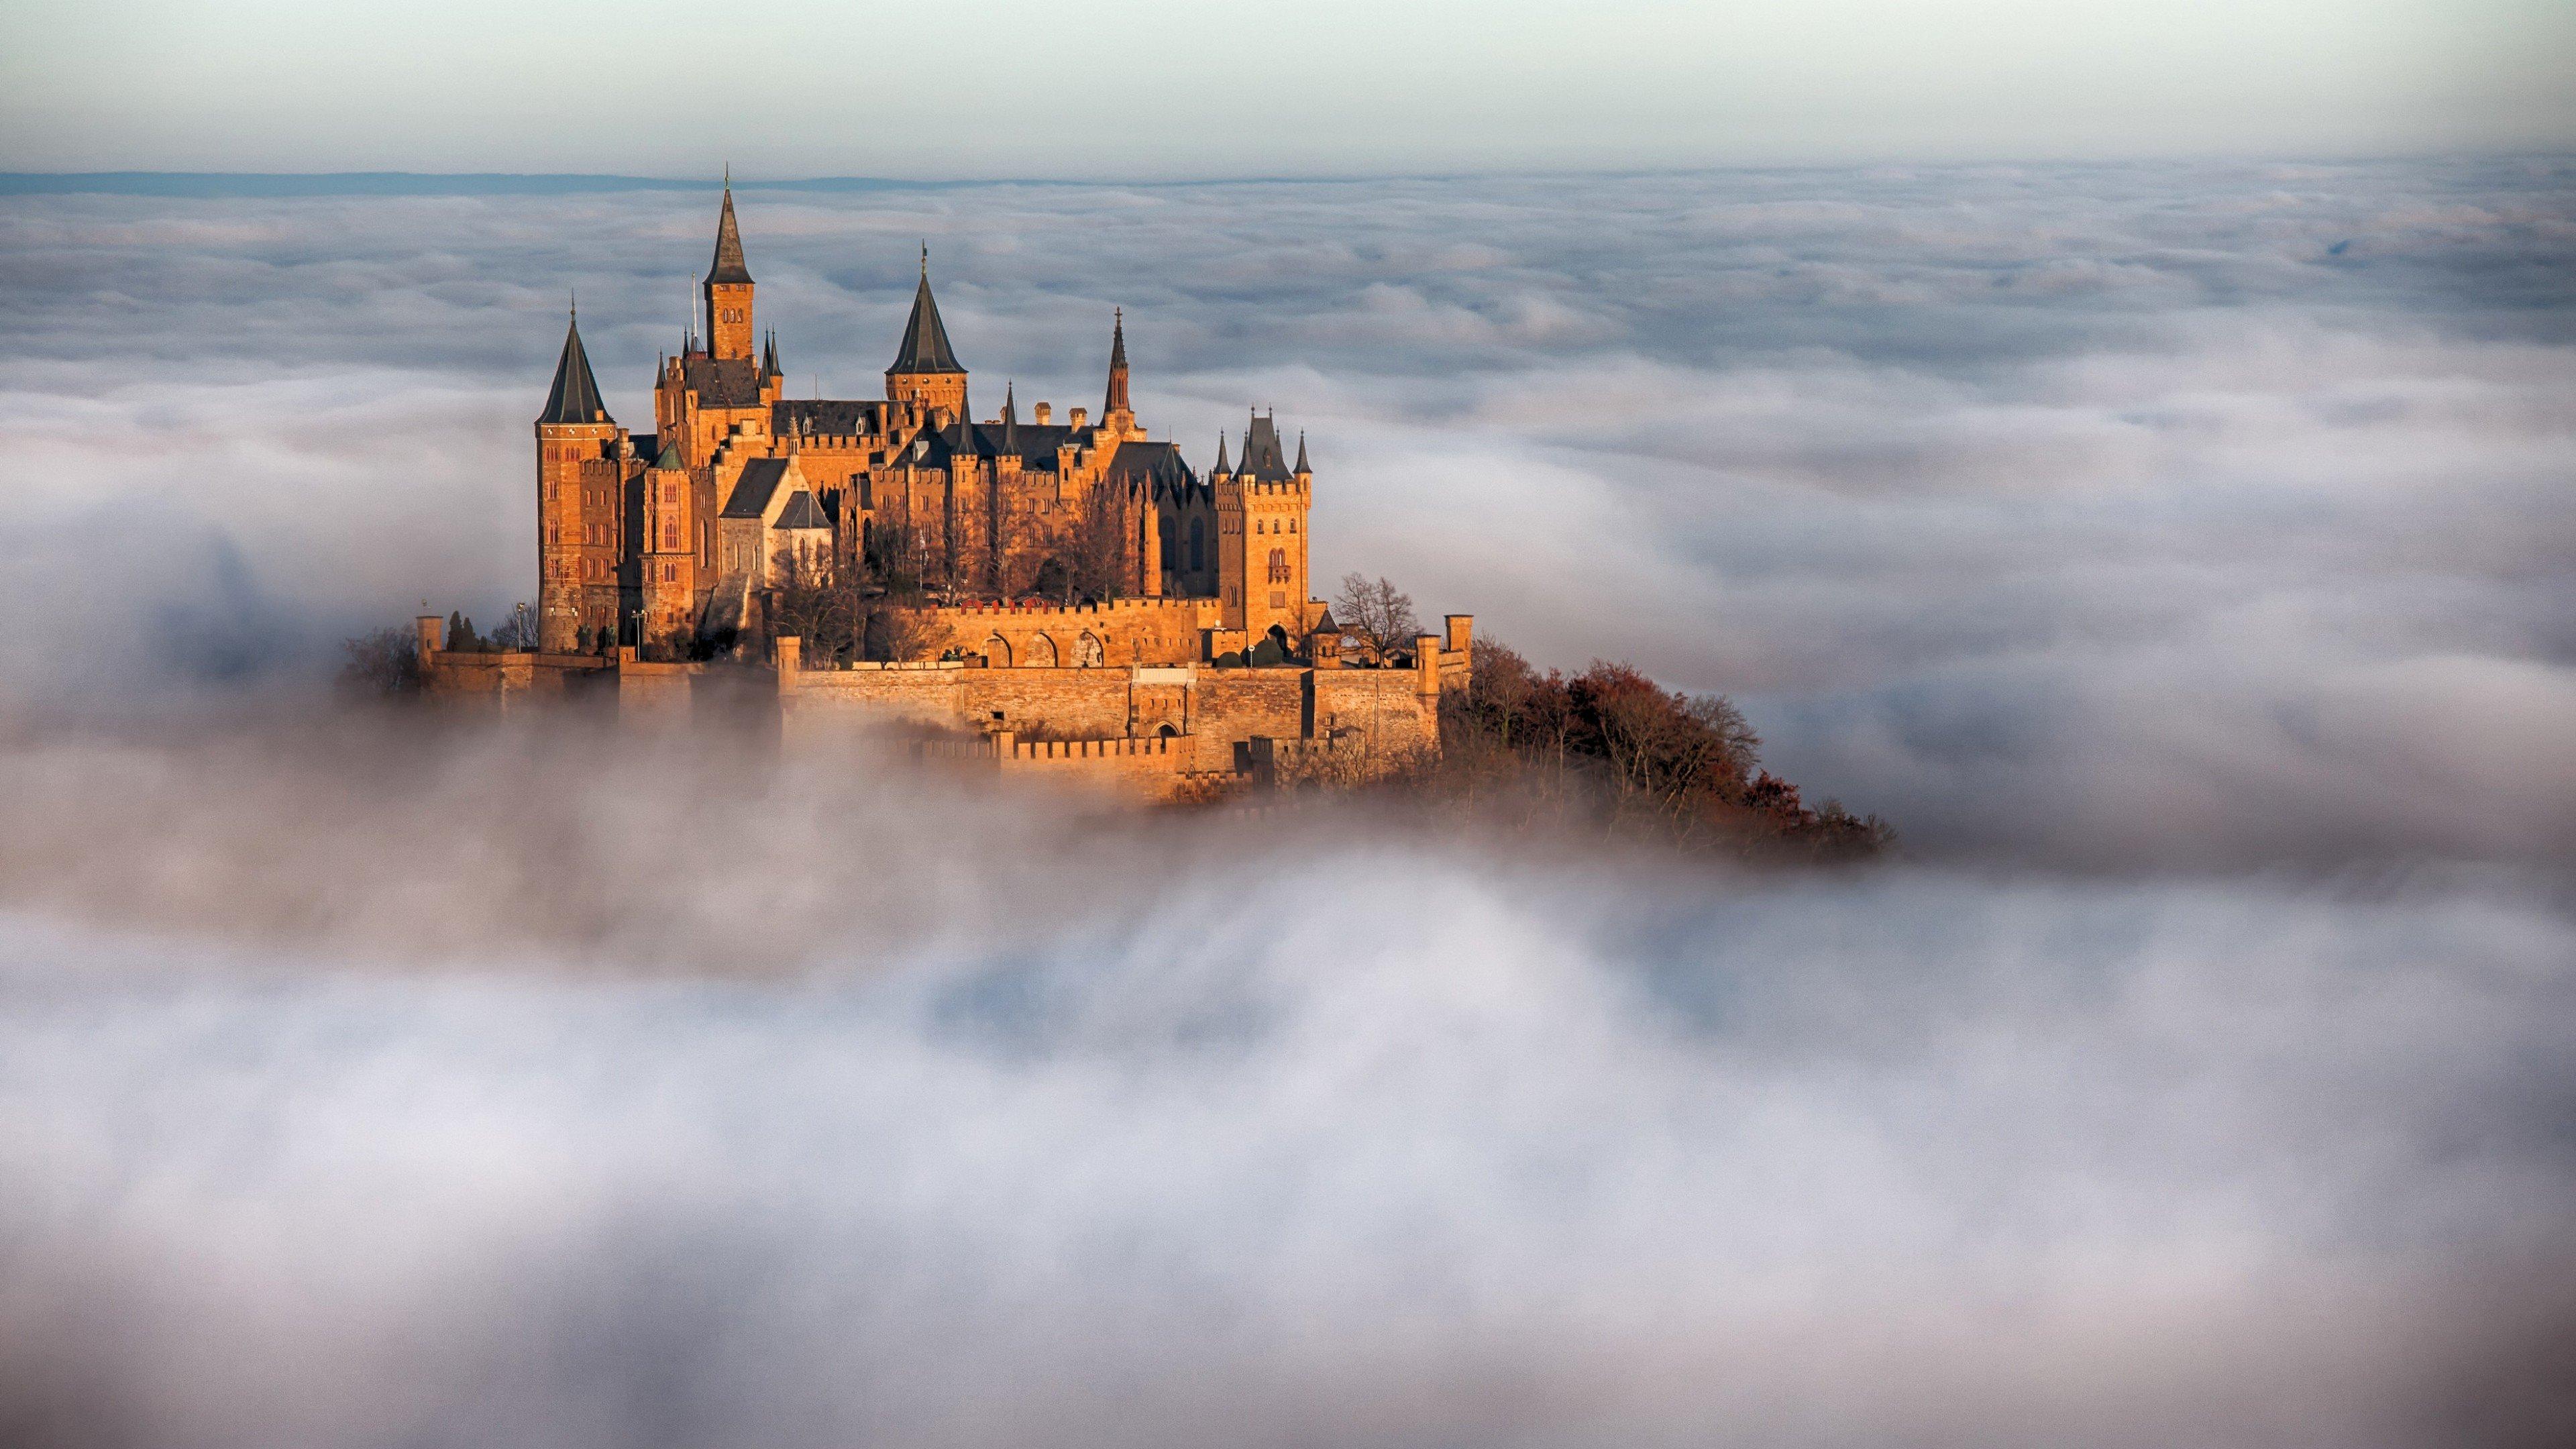 Wallpaper Hohenzollern Castle in Germany